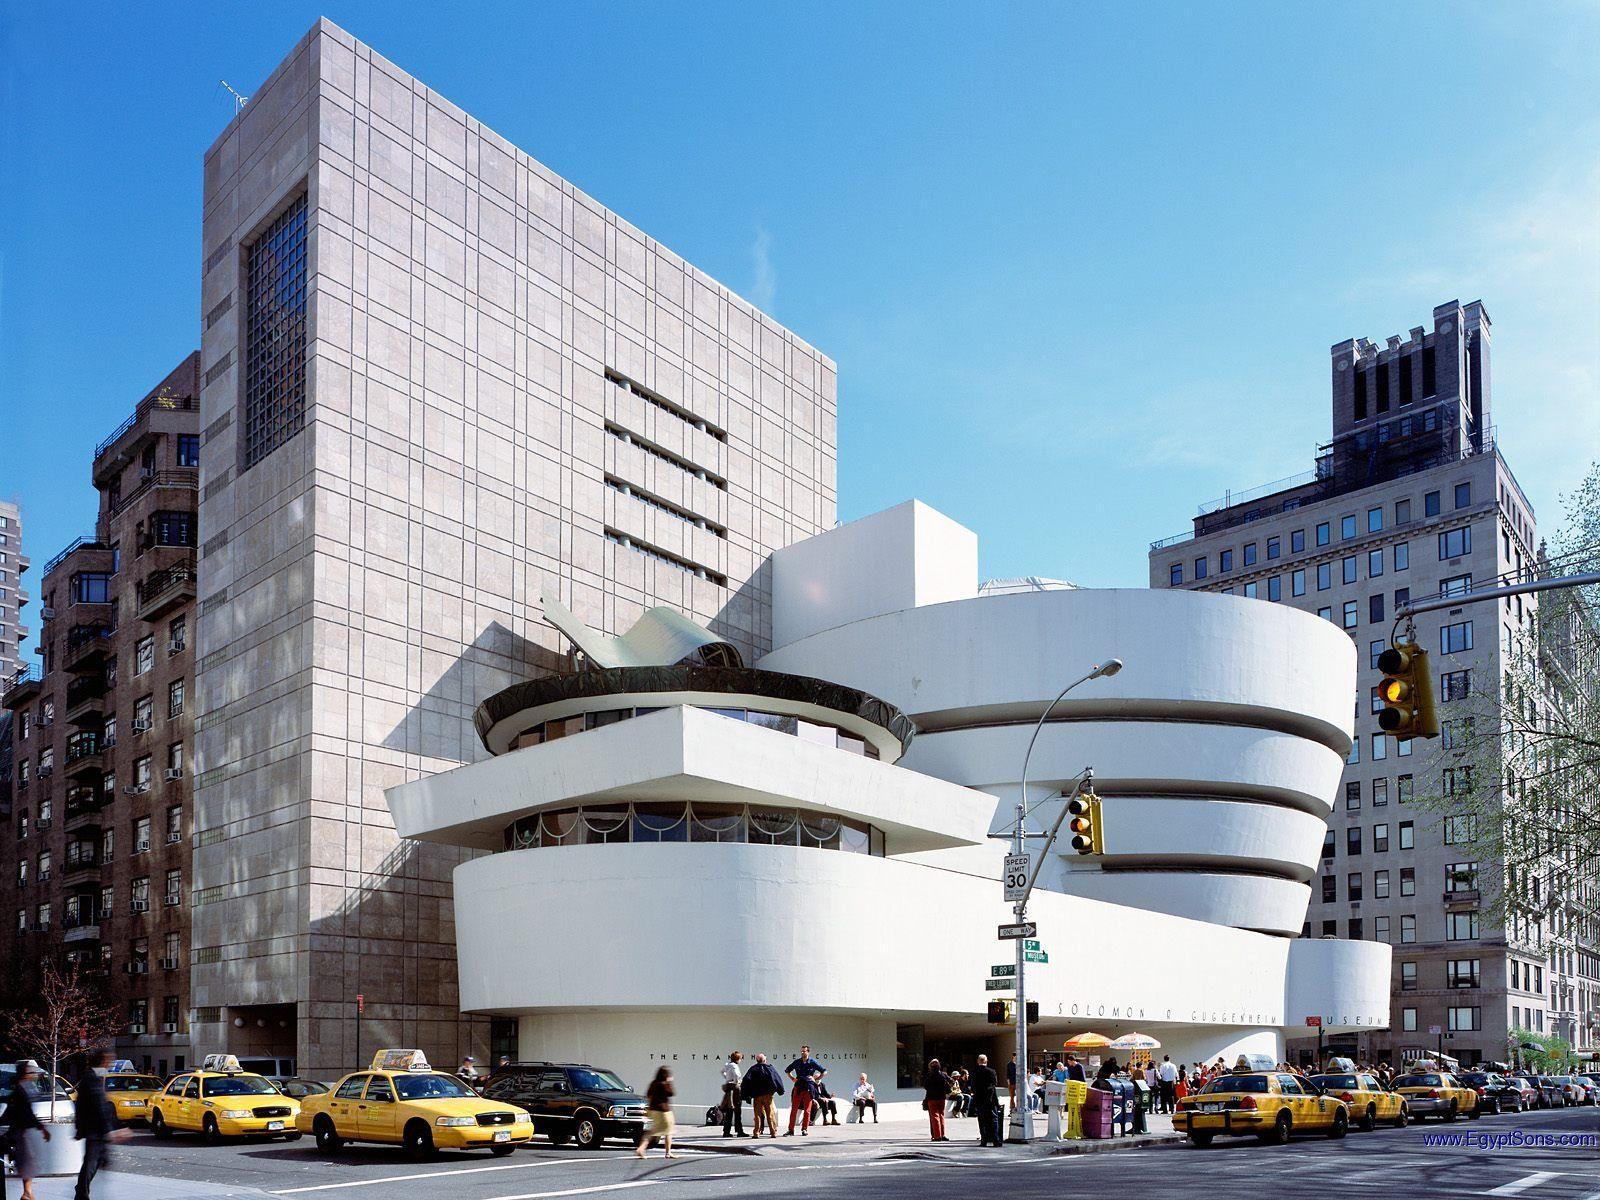 Frank Lloyd Wright Solomon R Guggenheim Museum New York New York 1959 Frank Lloyd Wright Architecture Frank Lloyd Wright Buildings Architecture Collection